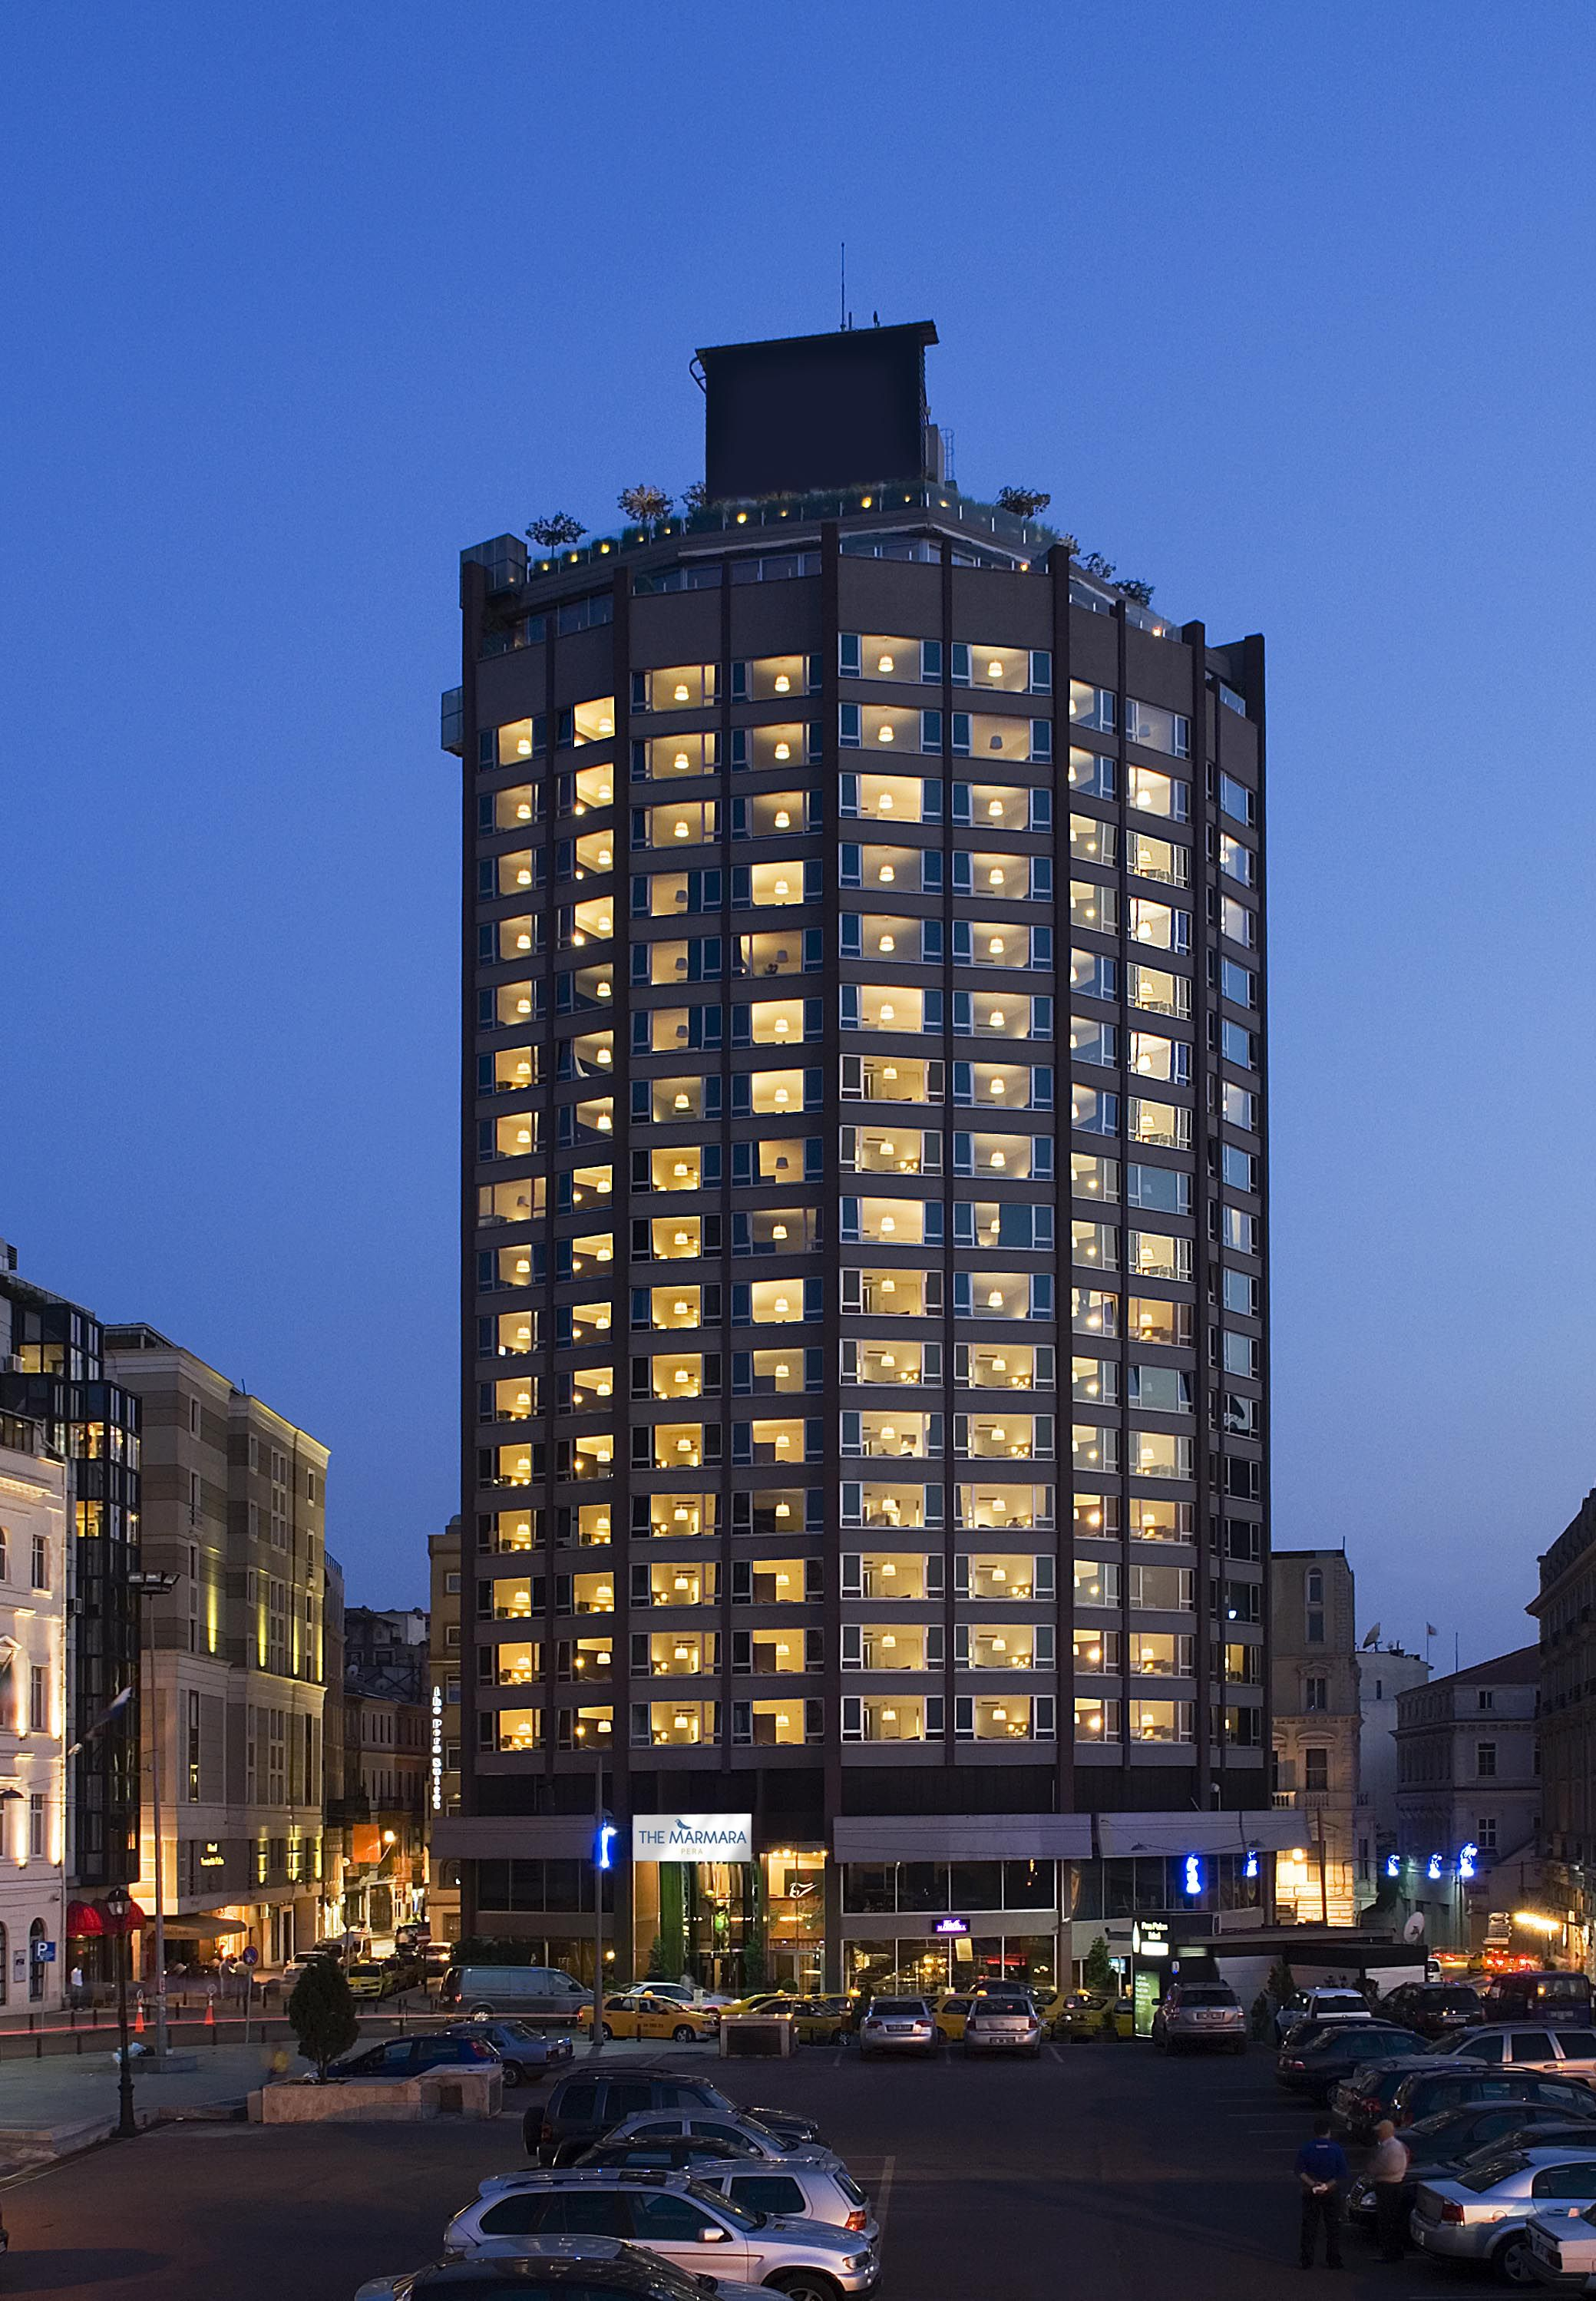 Marmara Pera Hotel Istanbul